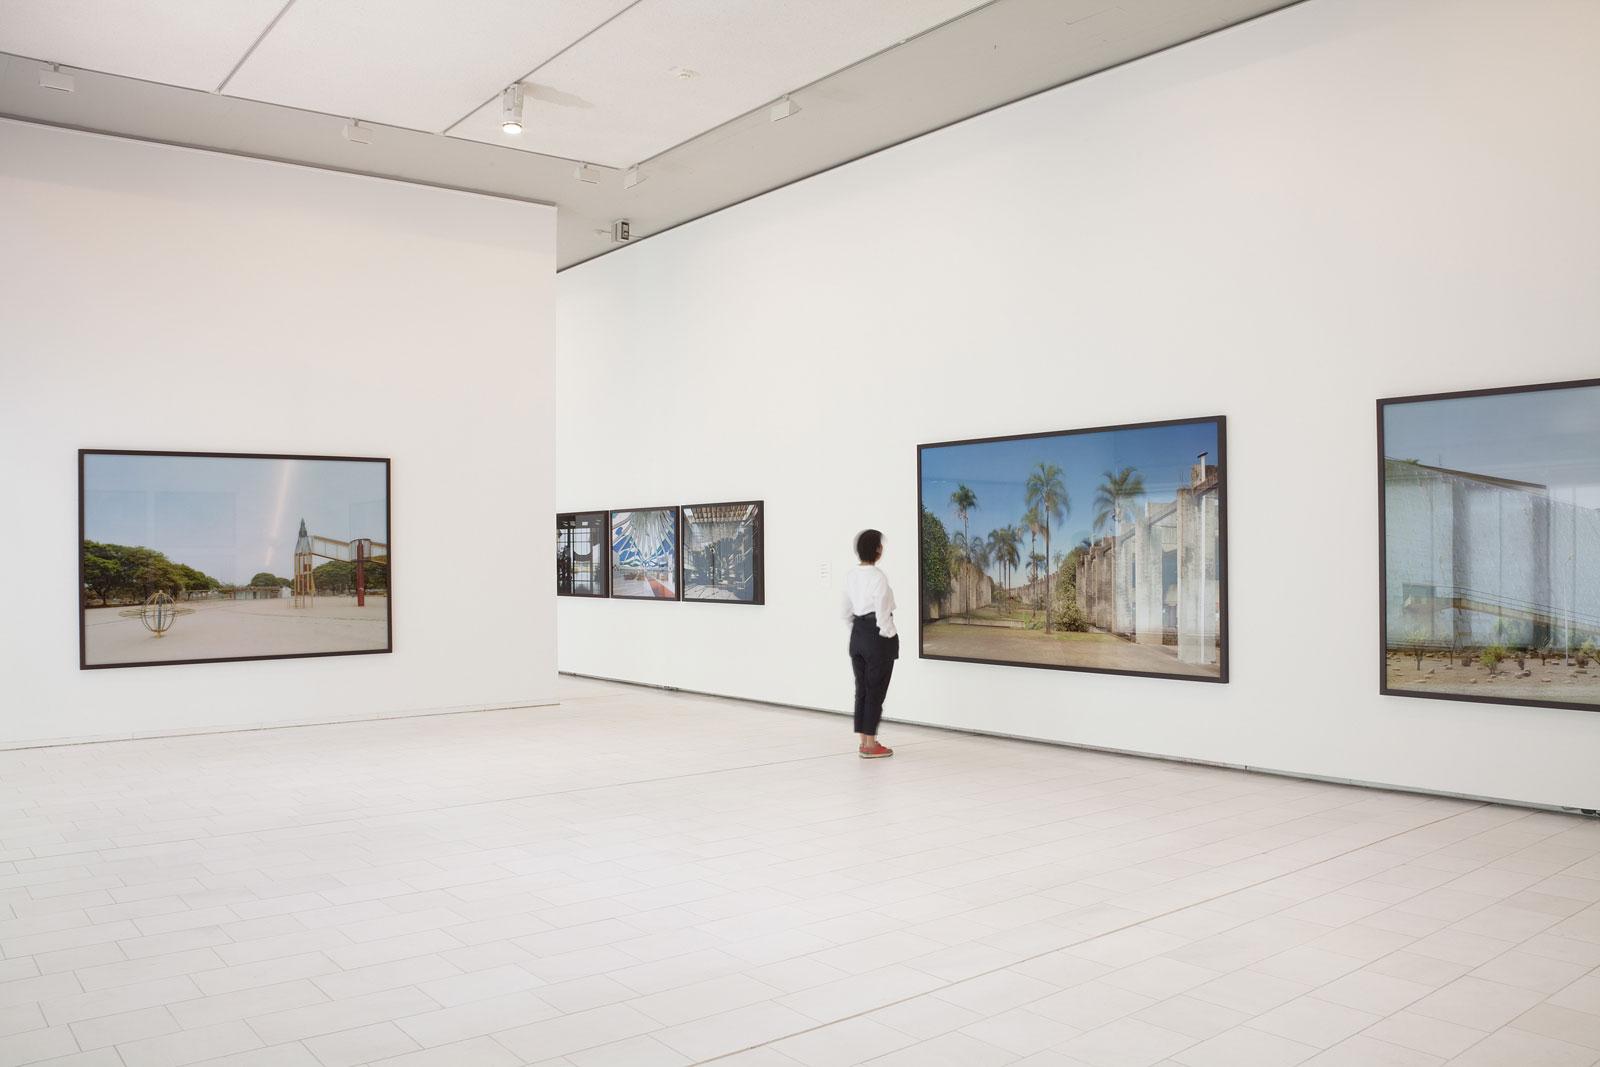 Archiv Utopia, Kunsthalle zu Kiel